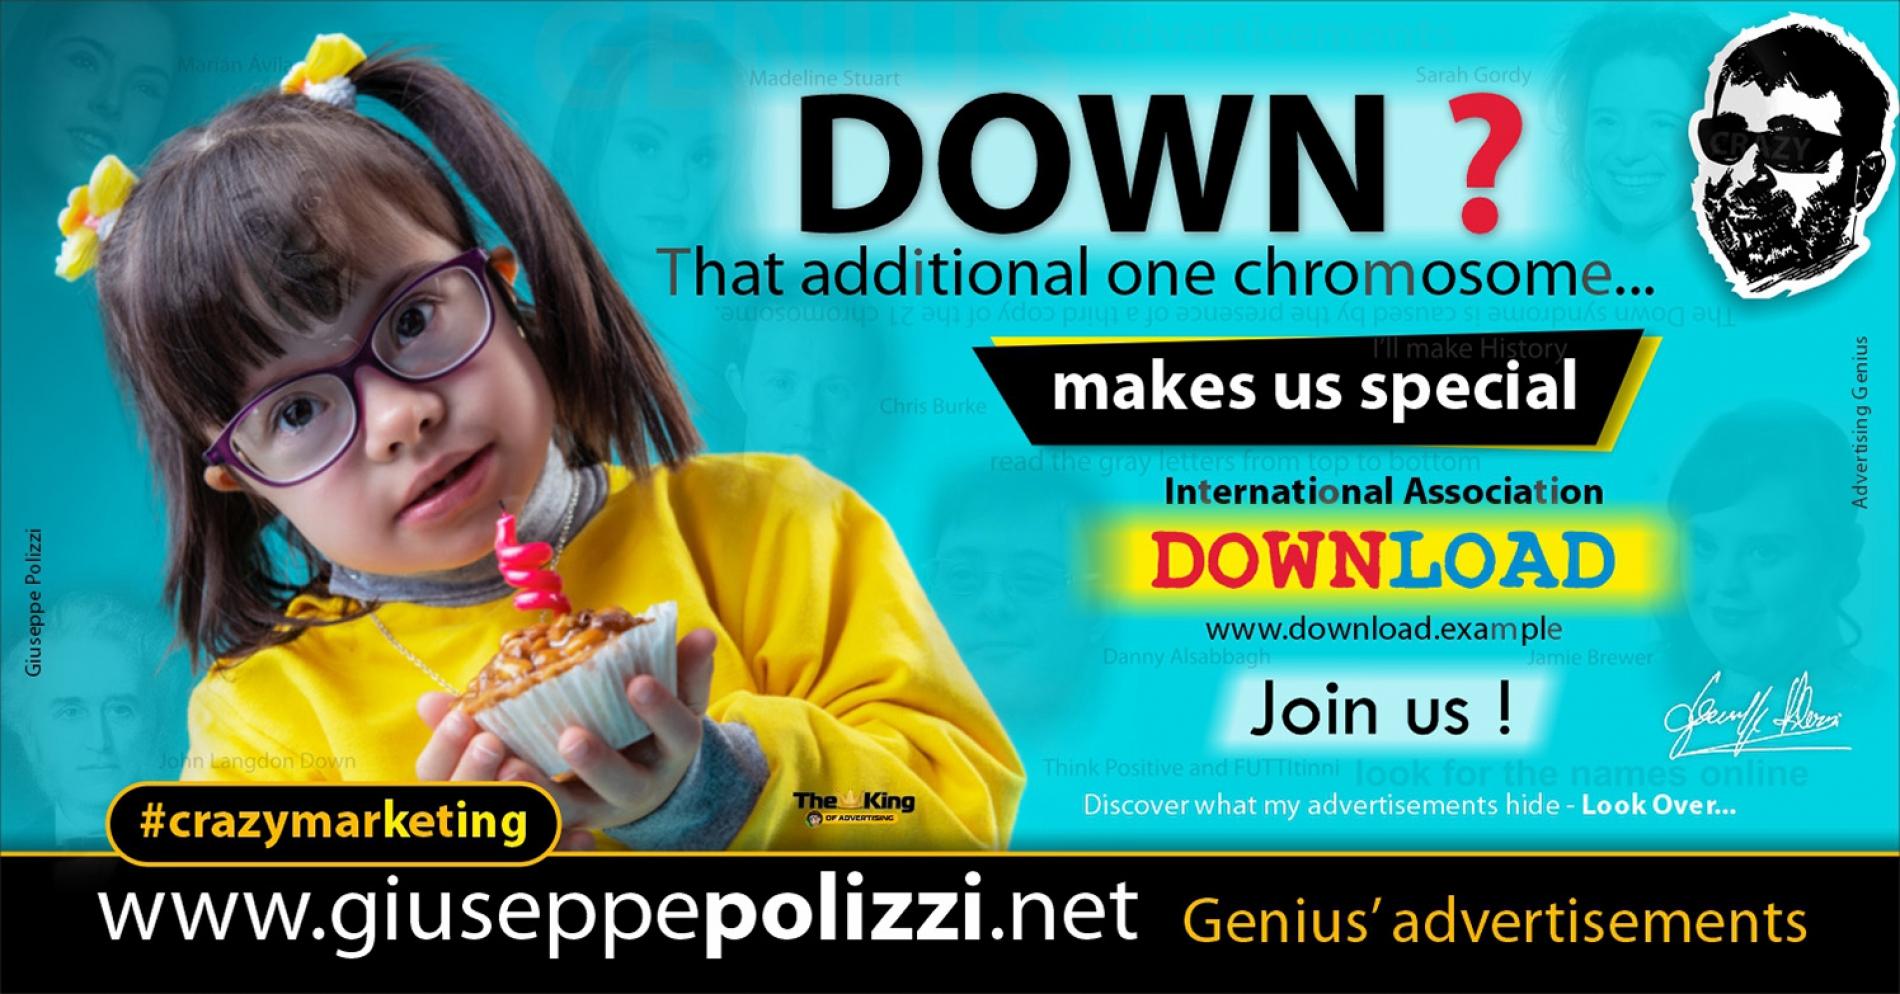 giuseppe polizzi crazymarketing DOWN advertisements